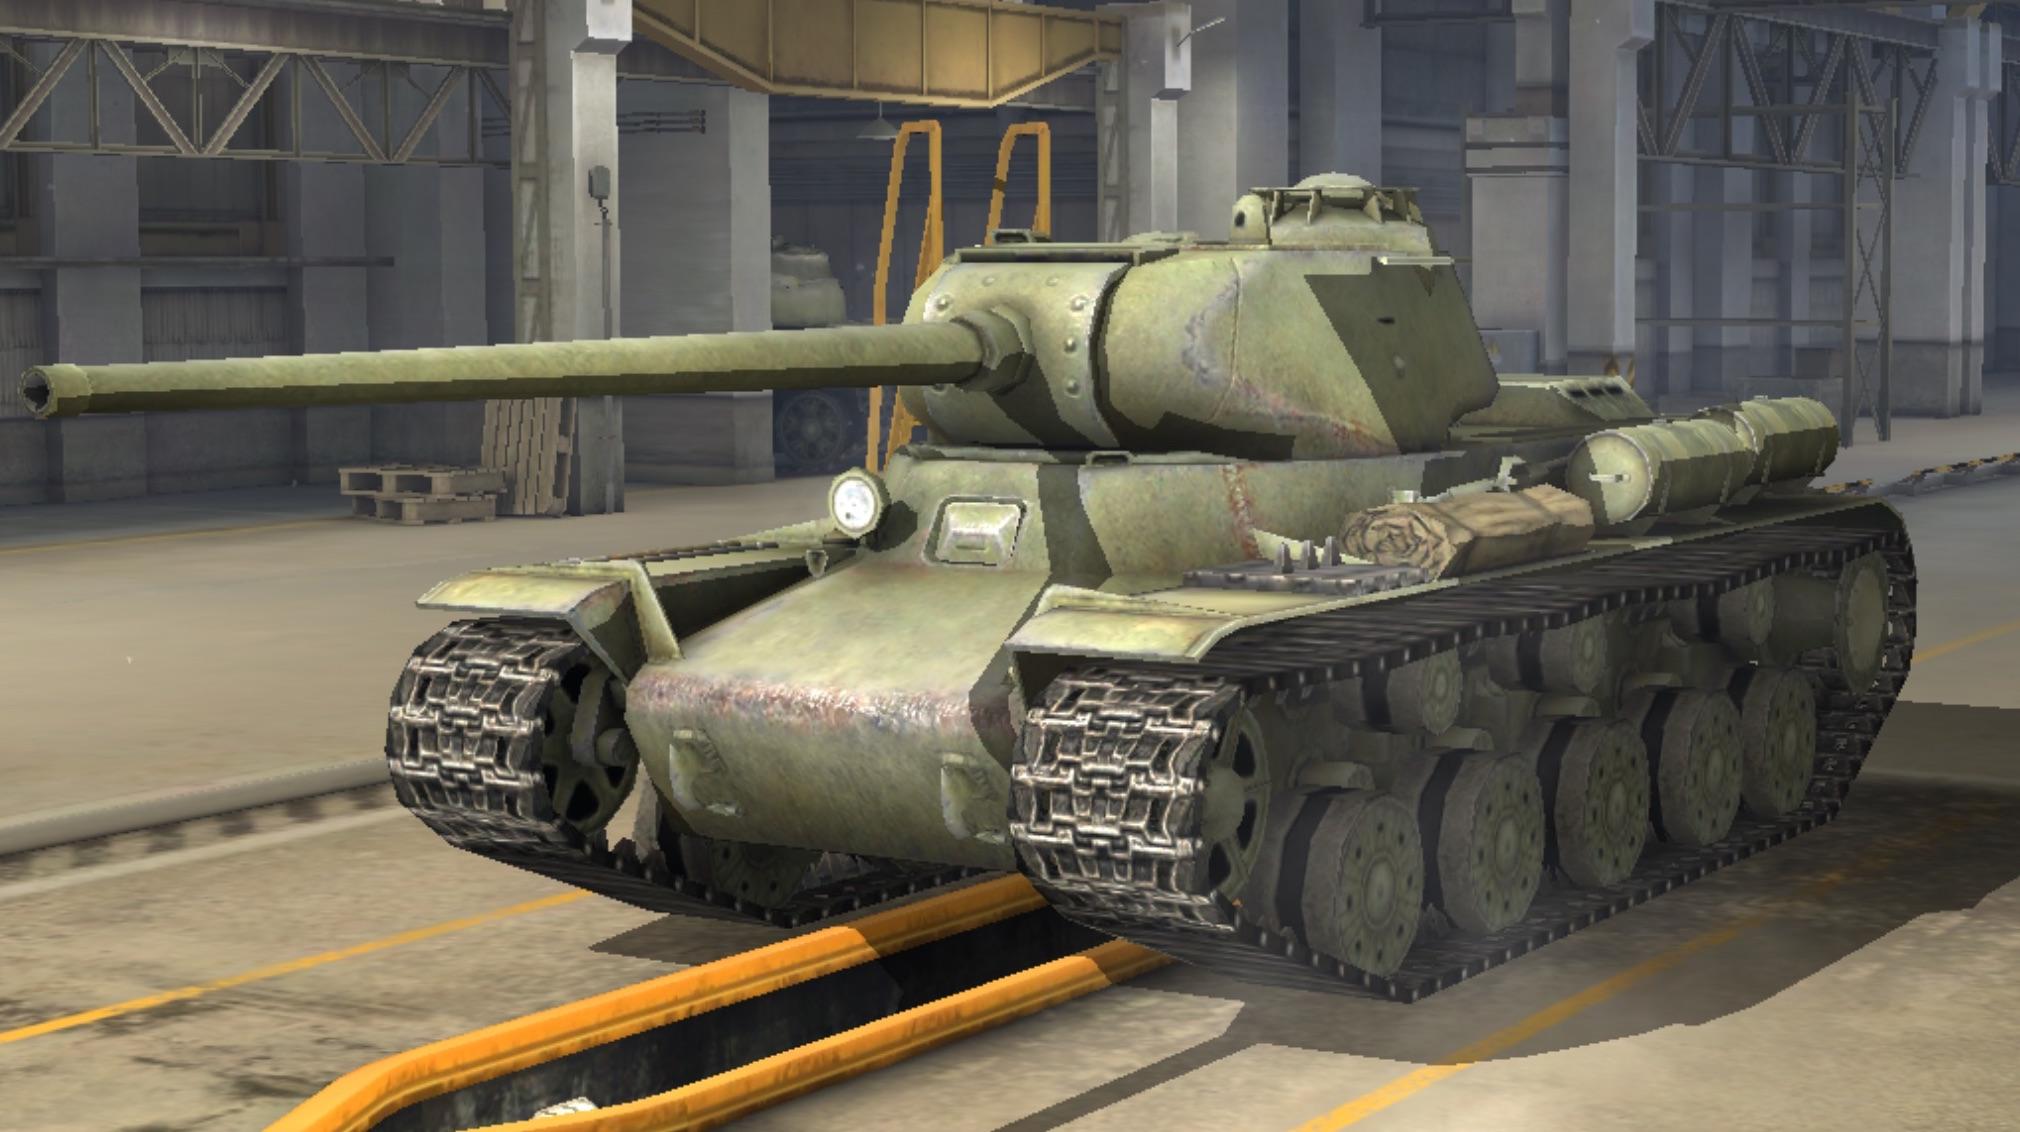 KV-13 - World of Tanks Blitz Wiki*